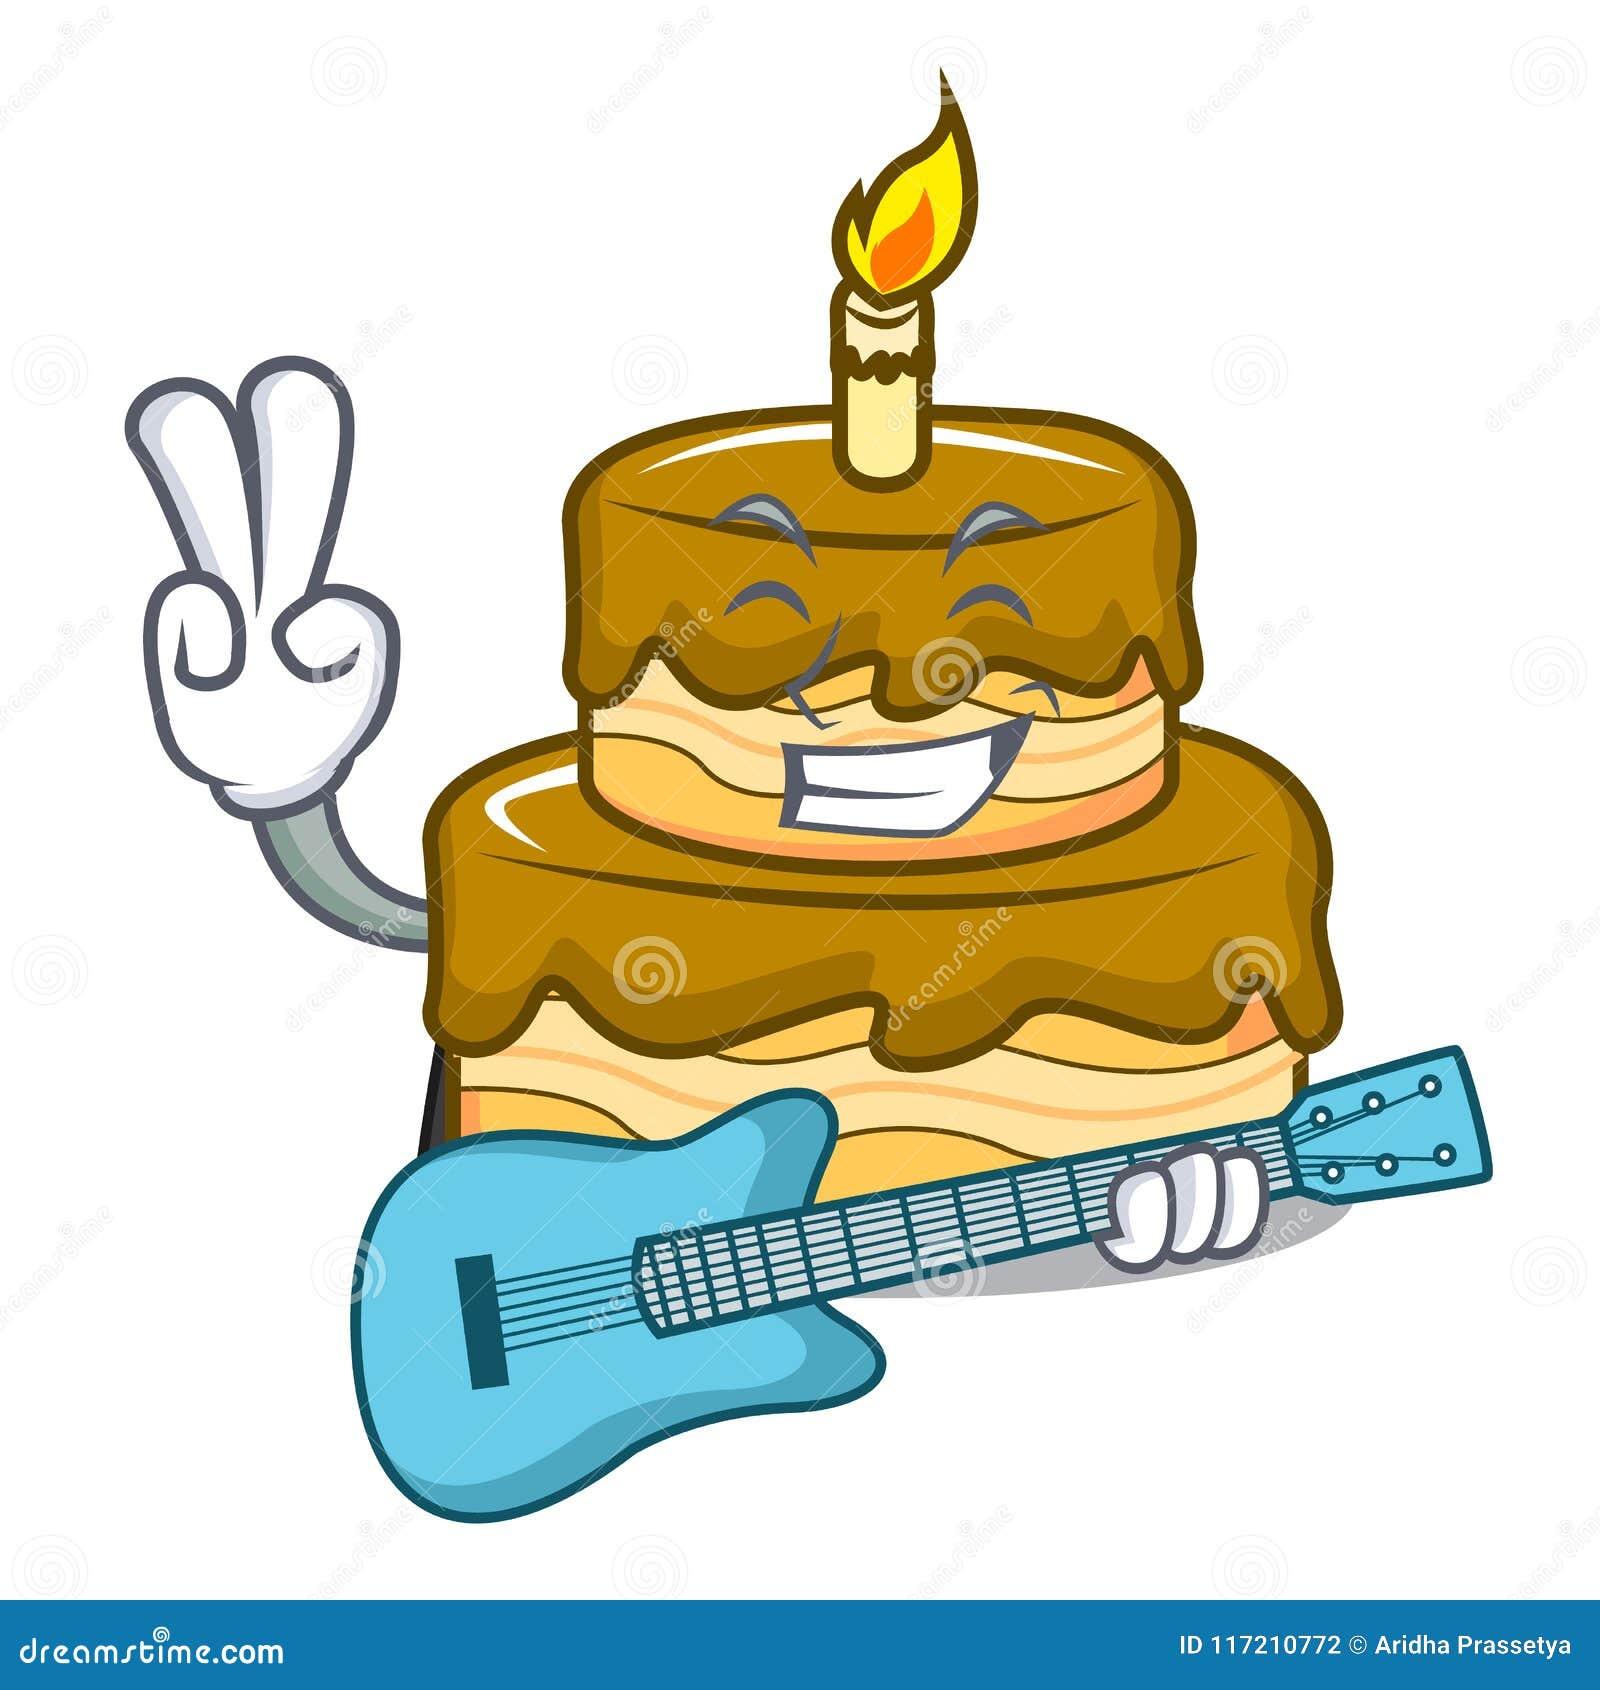 Peachy With Guitar Birthday Cake Mascot Cartoon Stock Vector Funny Birthday Cards Online Unhofree Goldxyz